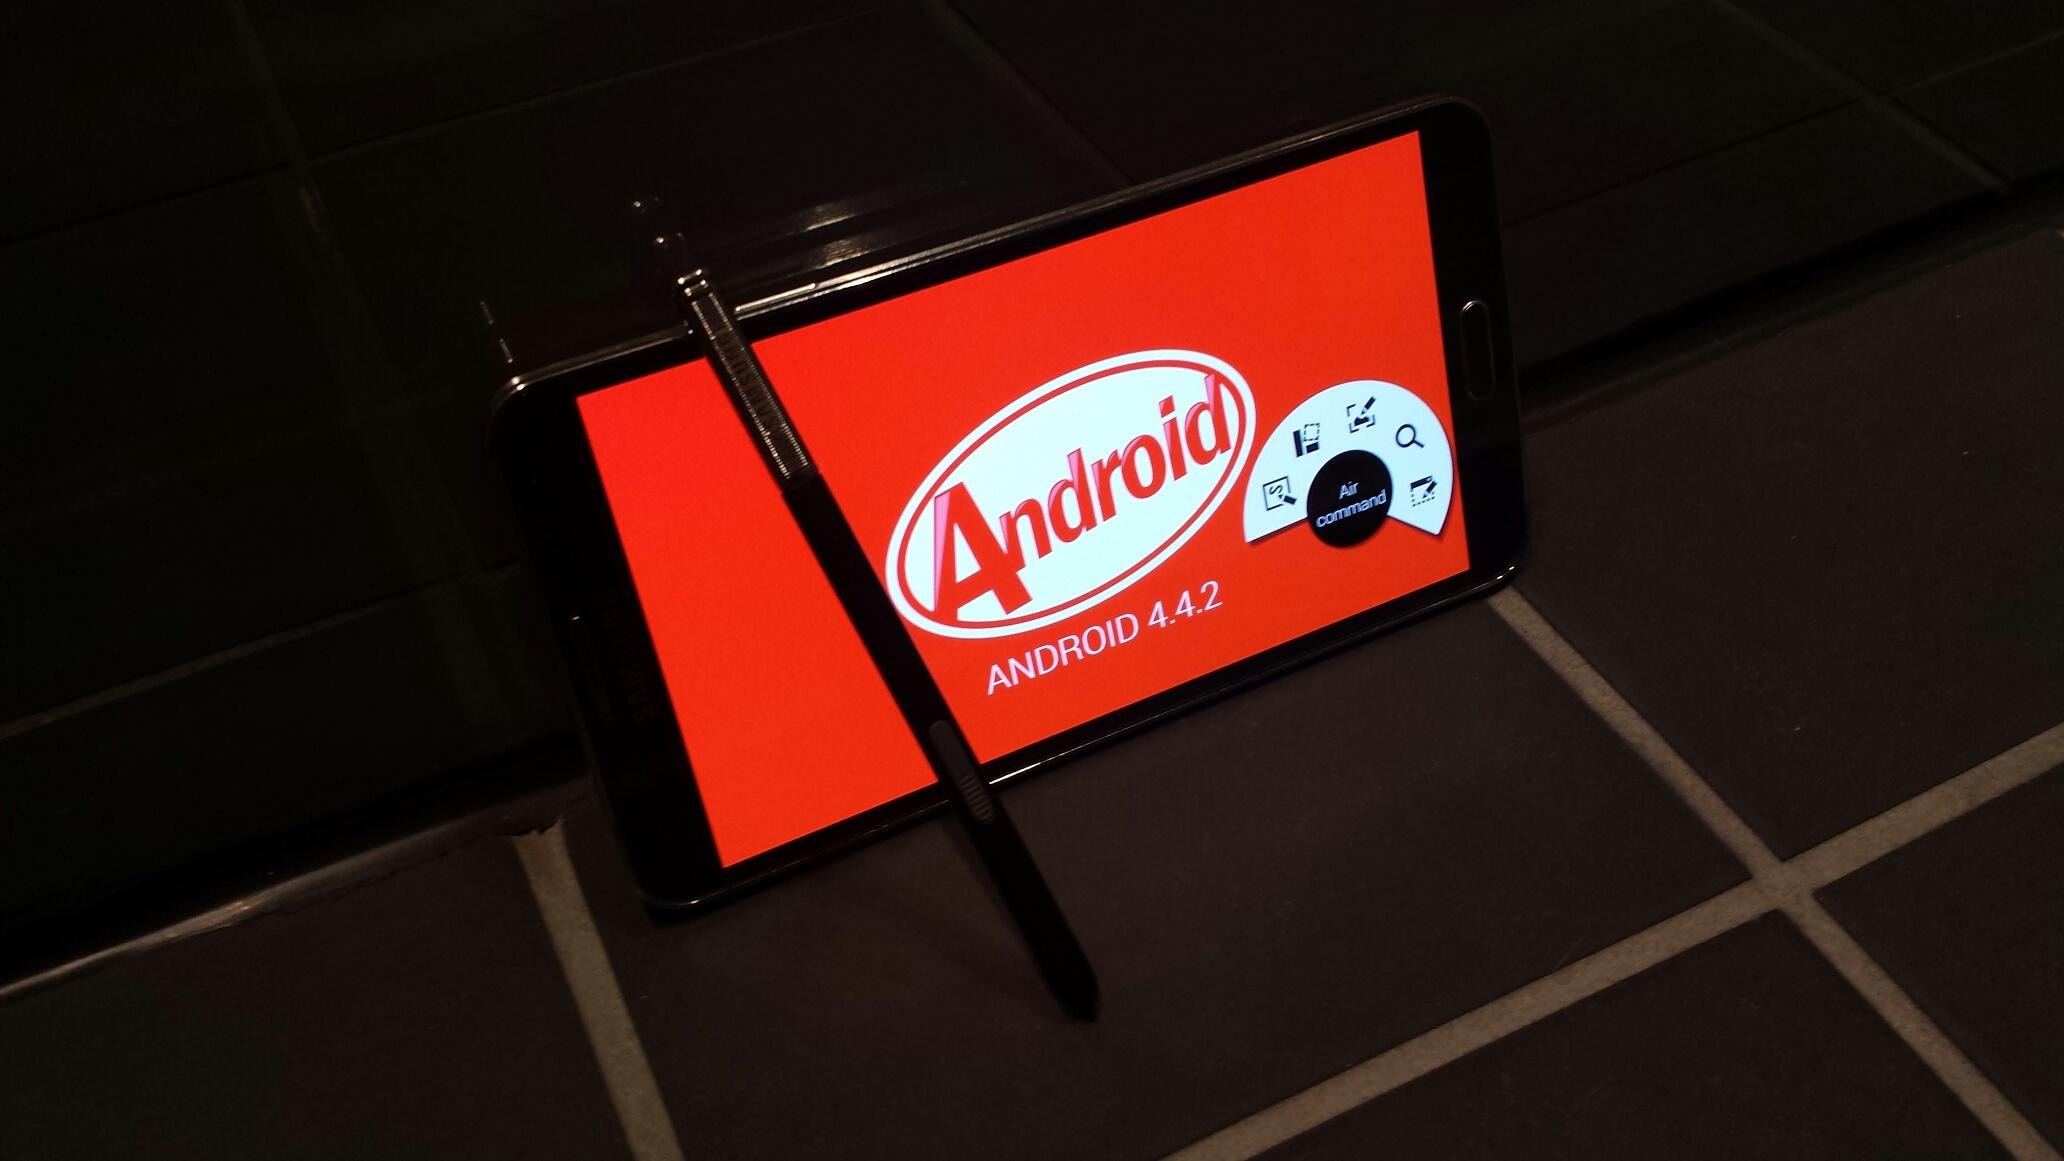 Galaxy-Note-2-KitKat-update